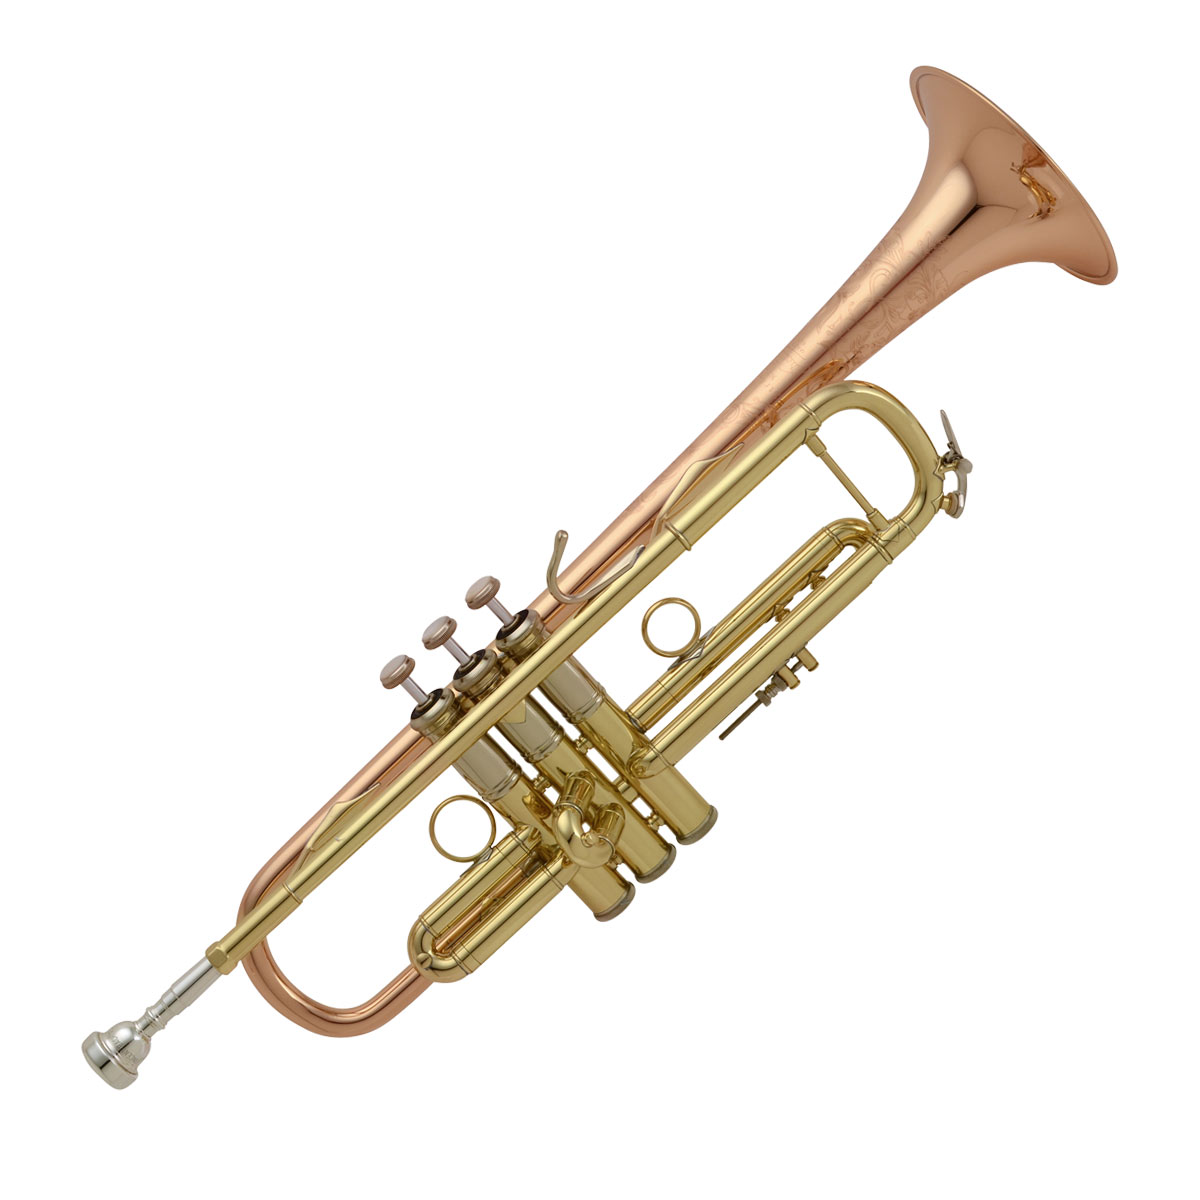 Bach / BIGCOPPER バック LR19043B CL ビッグコパー ラッカー仕上げ B♭トランペット【お取り寄せ】【5年保証】